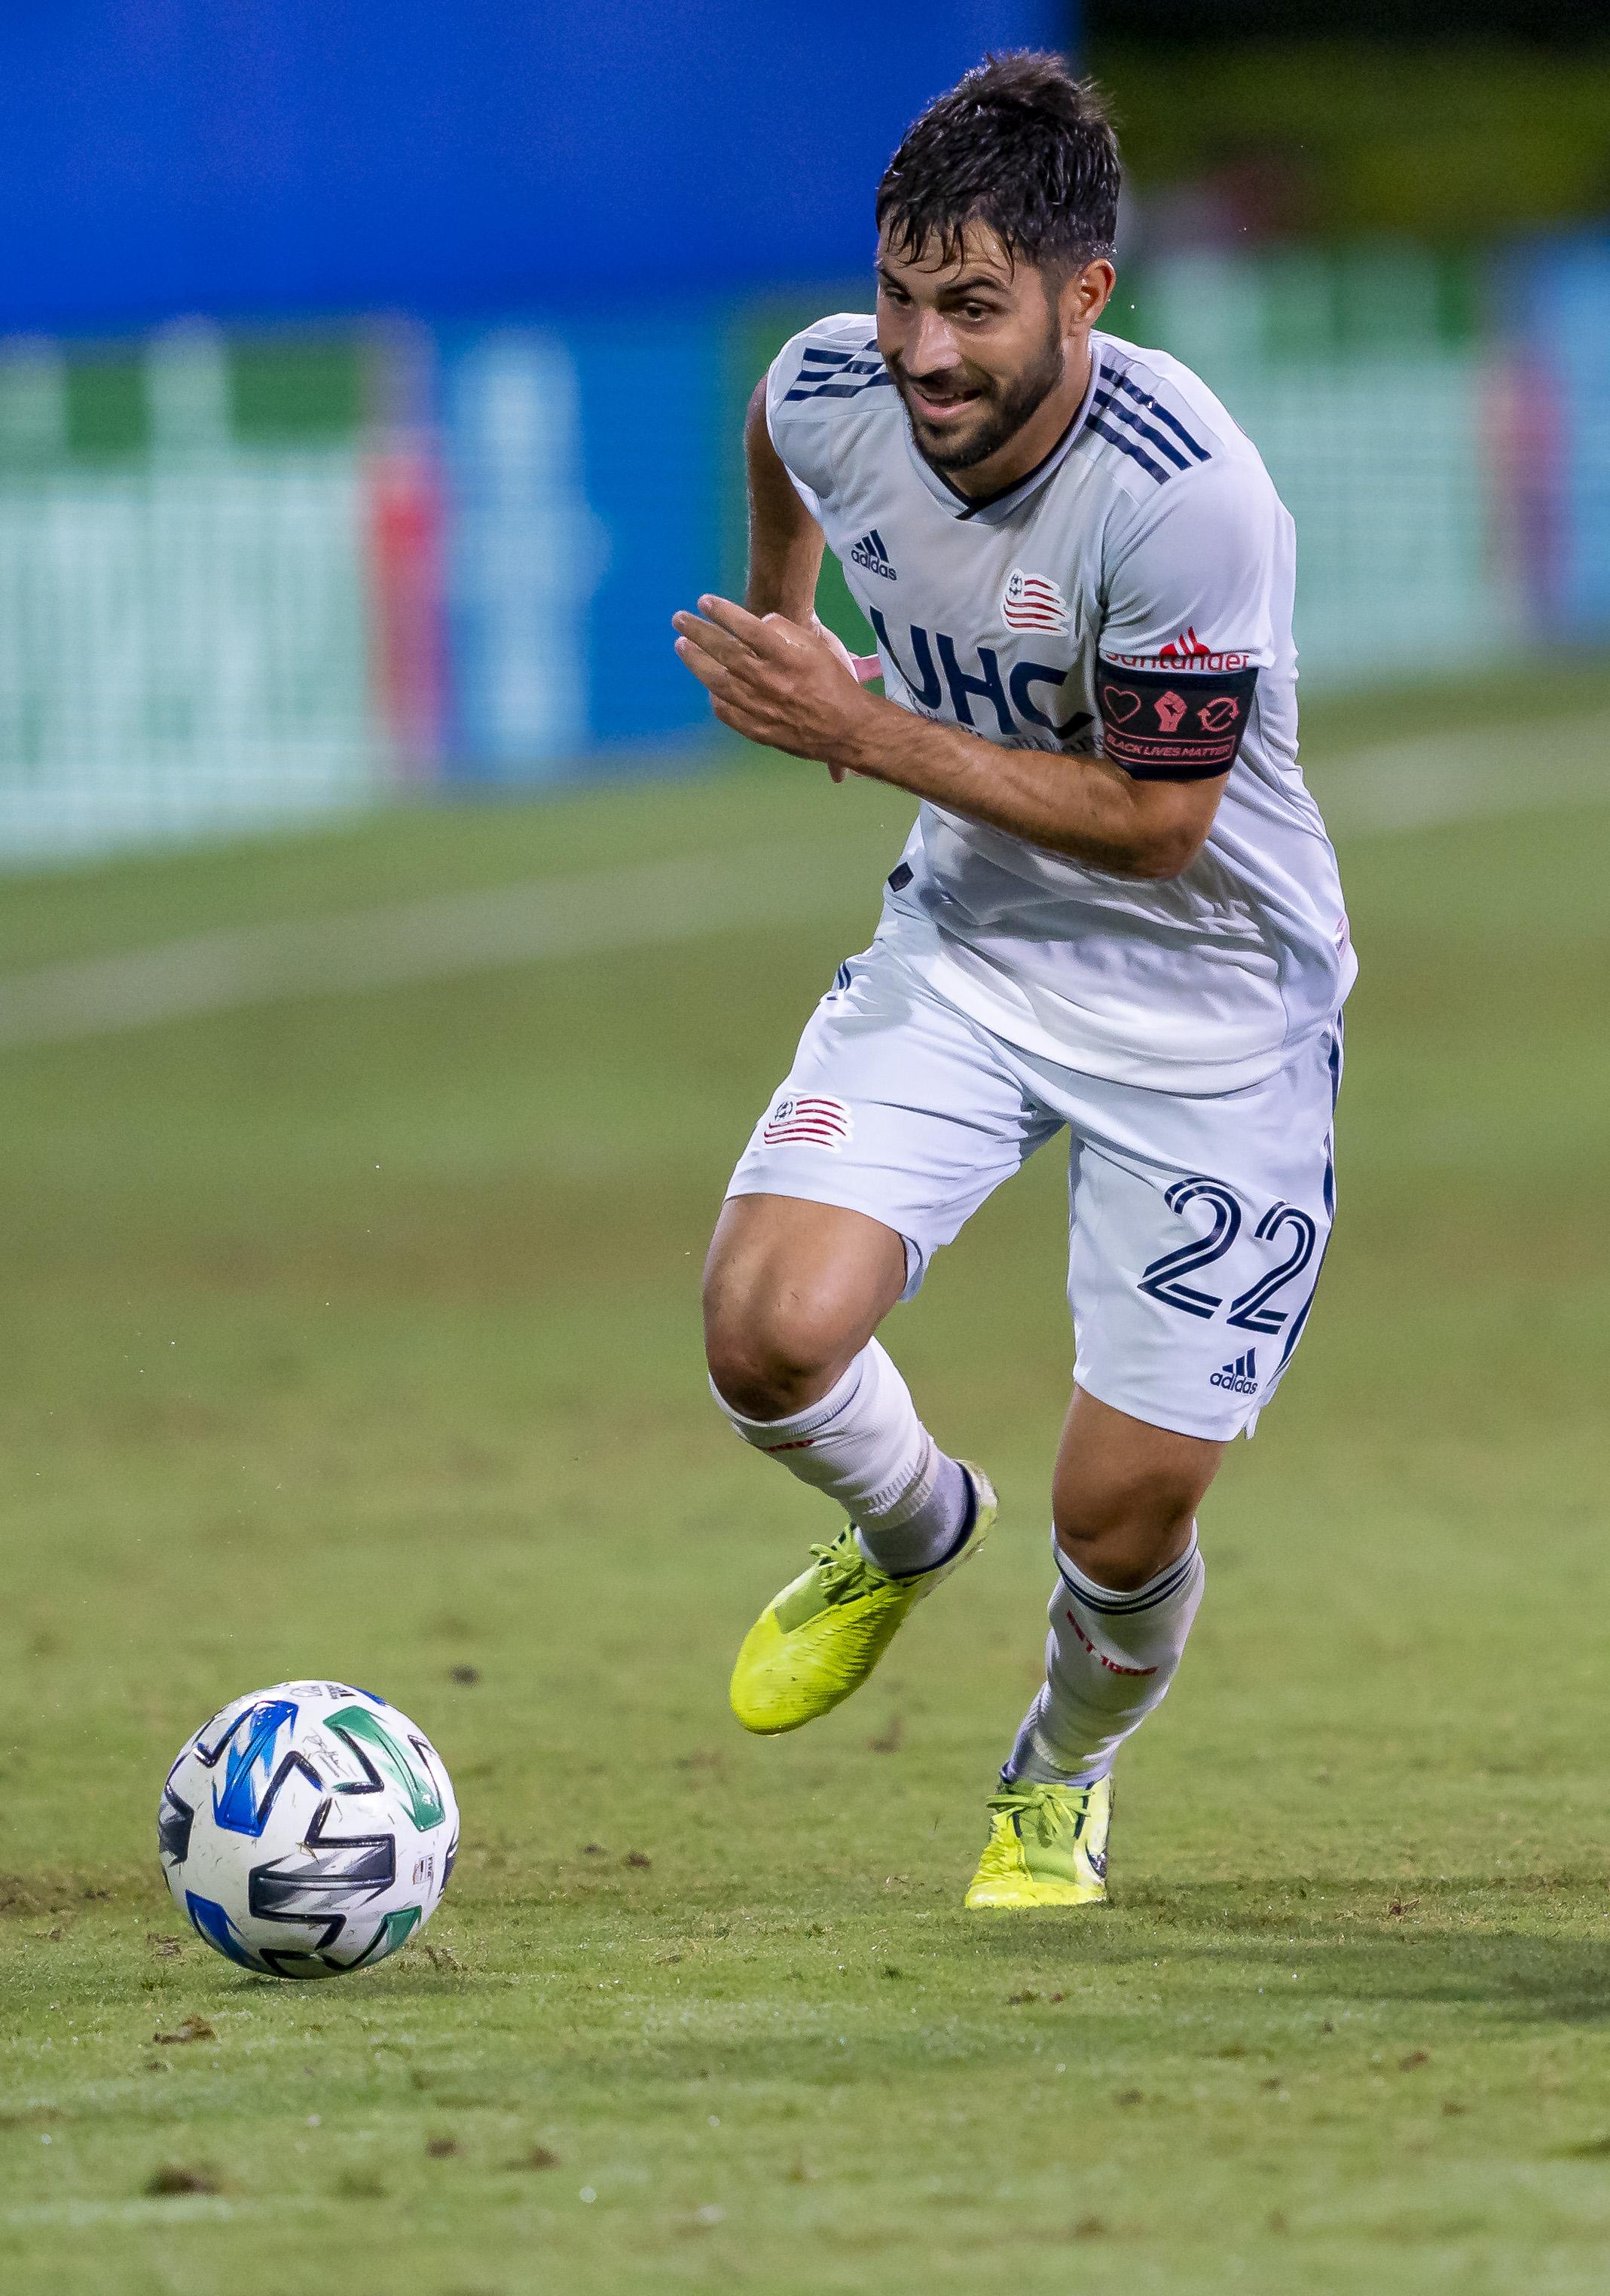 SOCCER: JUL 17 MLS - DC United v New England Revolution